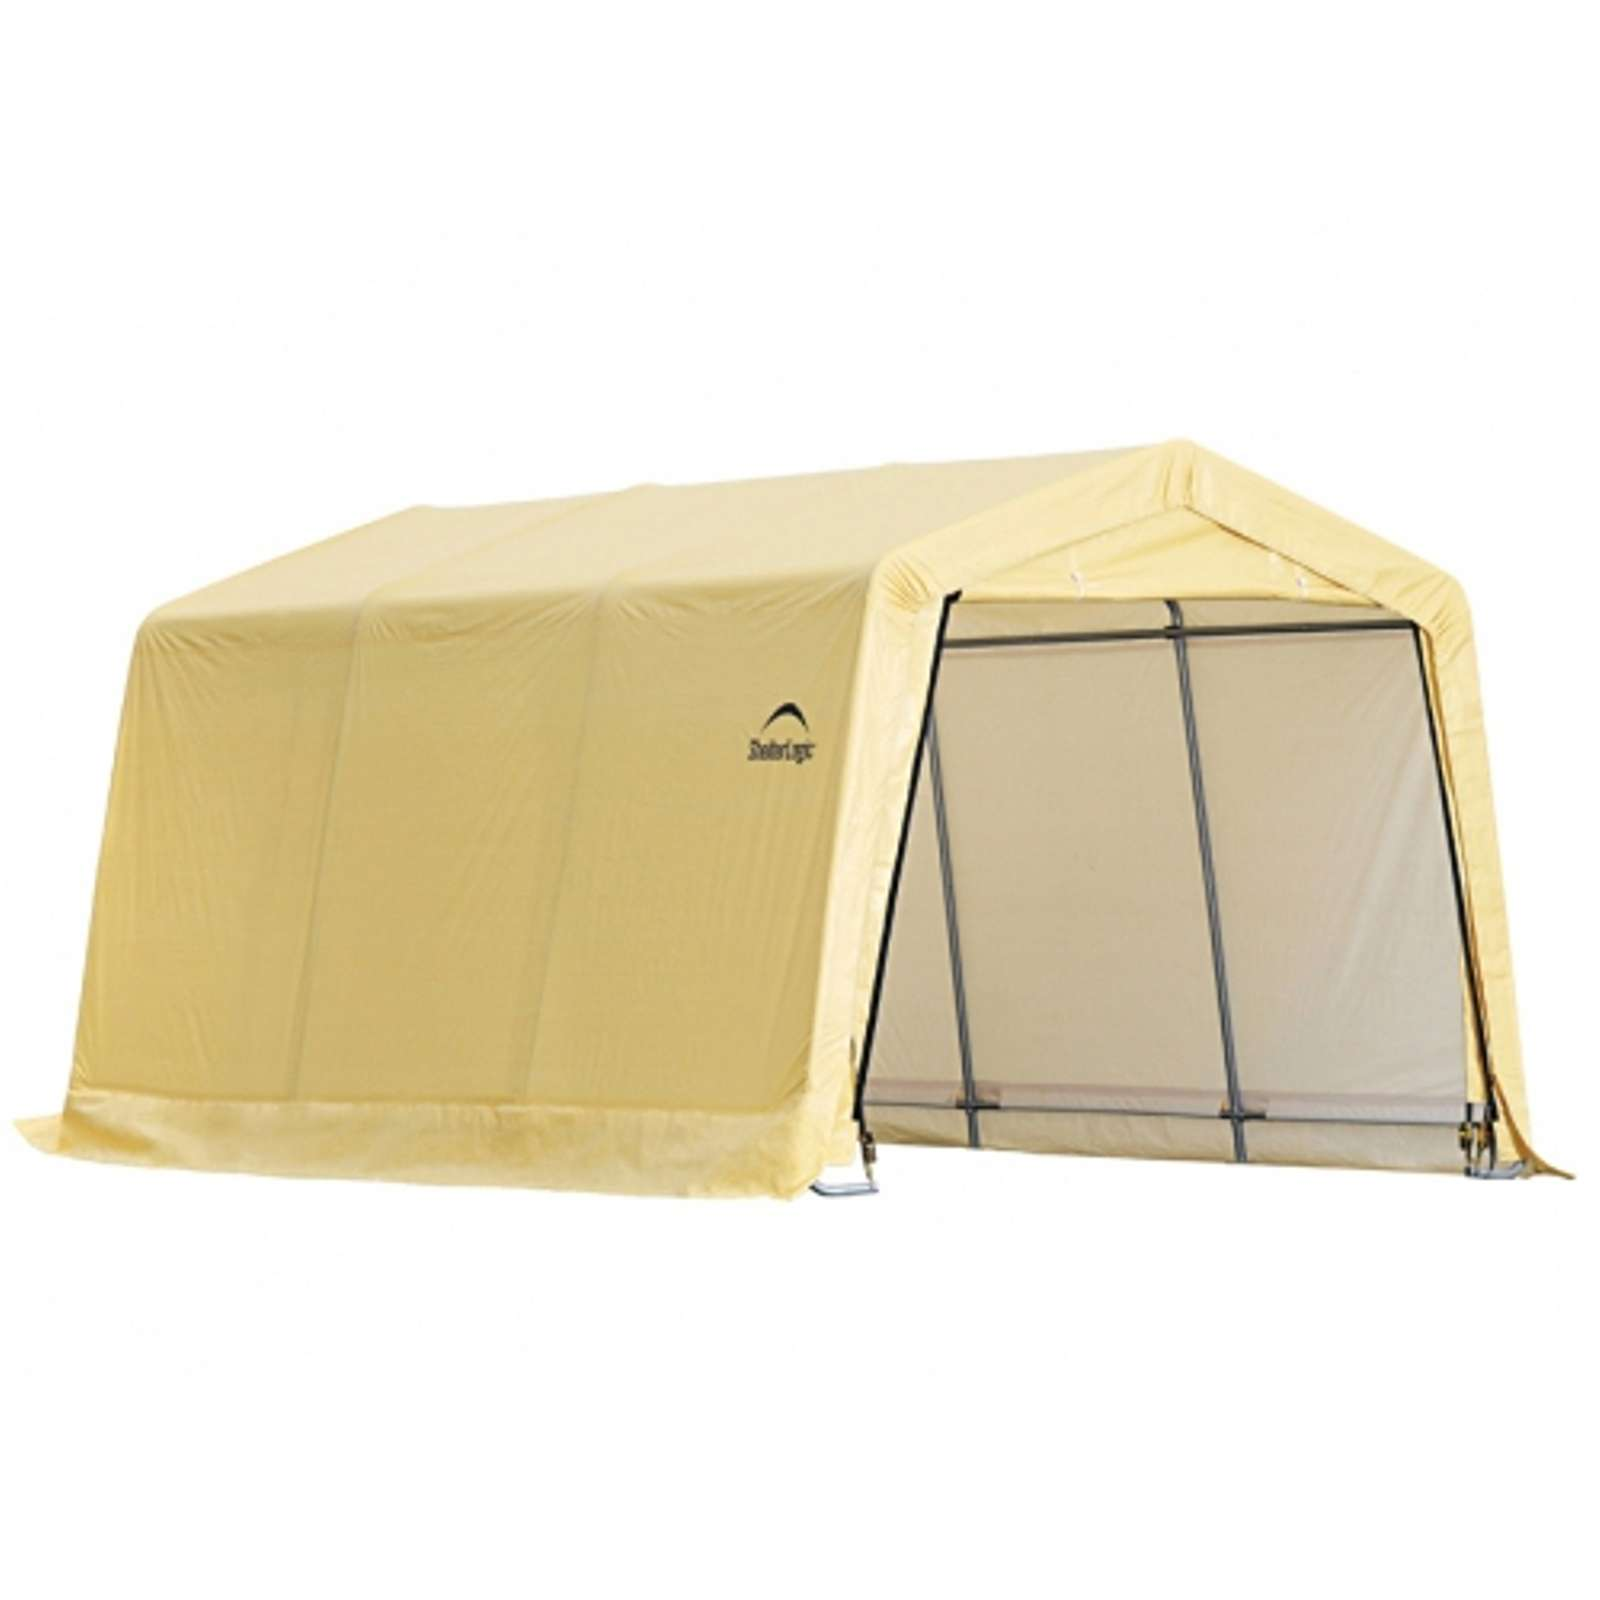 Гараж в коробке ShelterLogic 3x4,6x2,4м